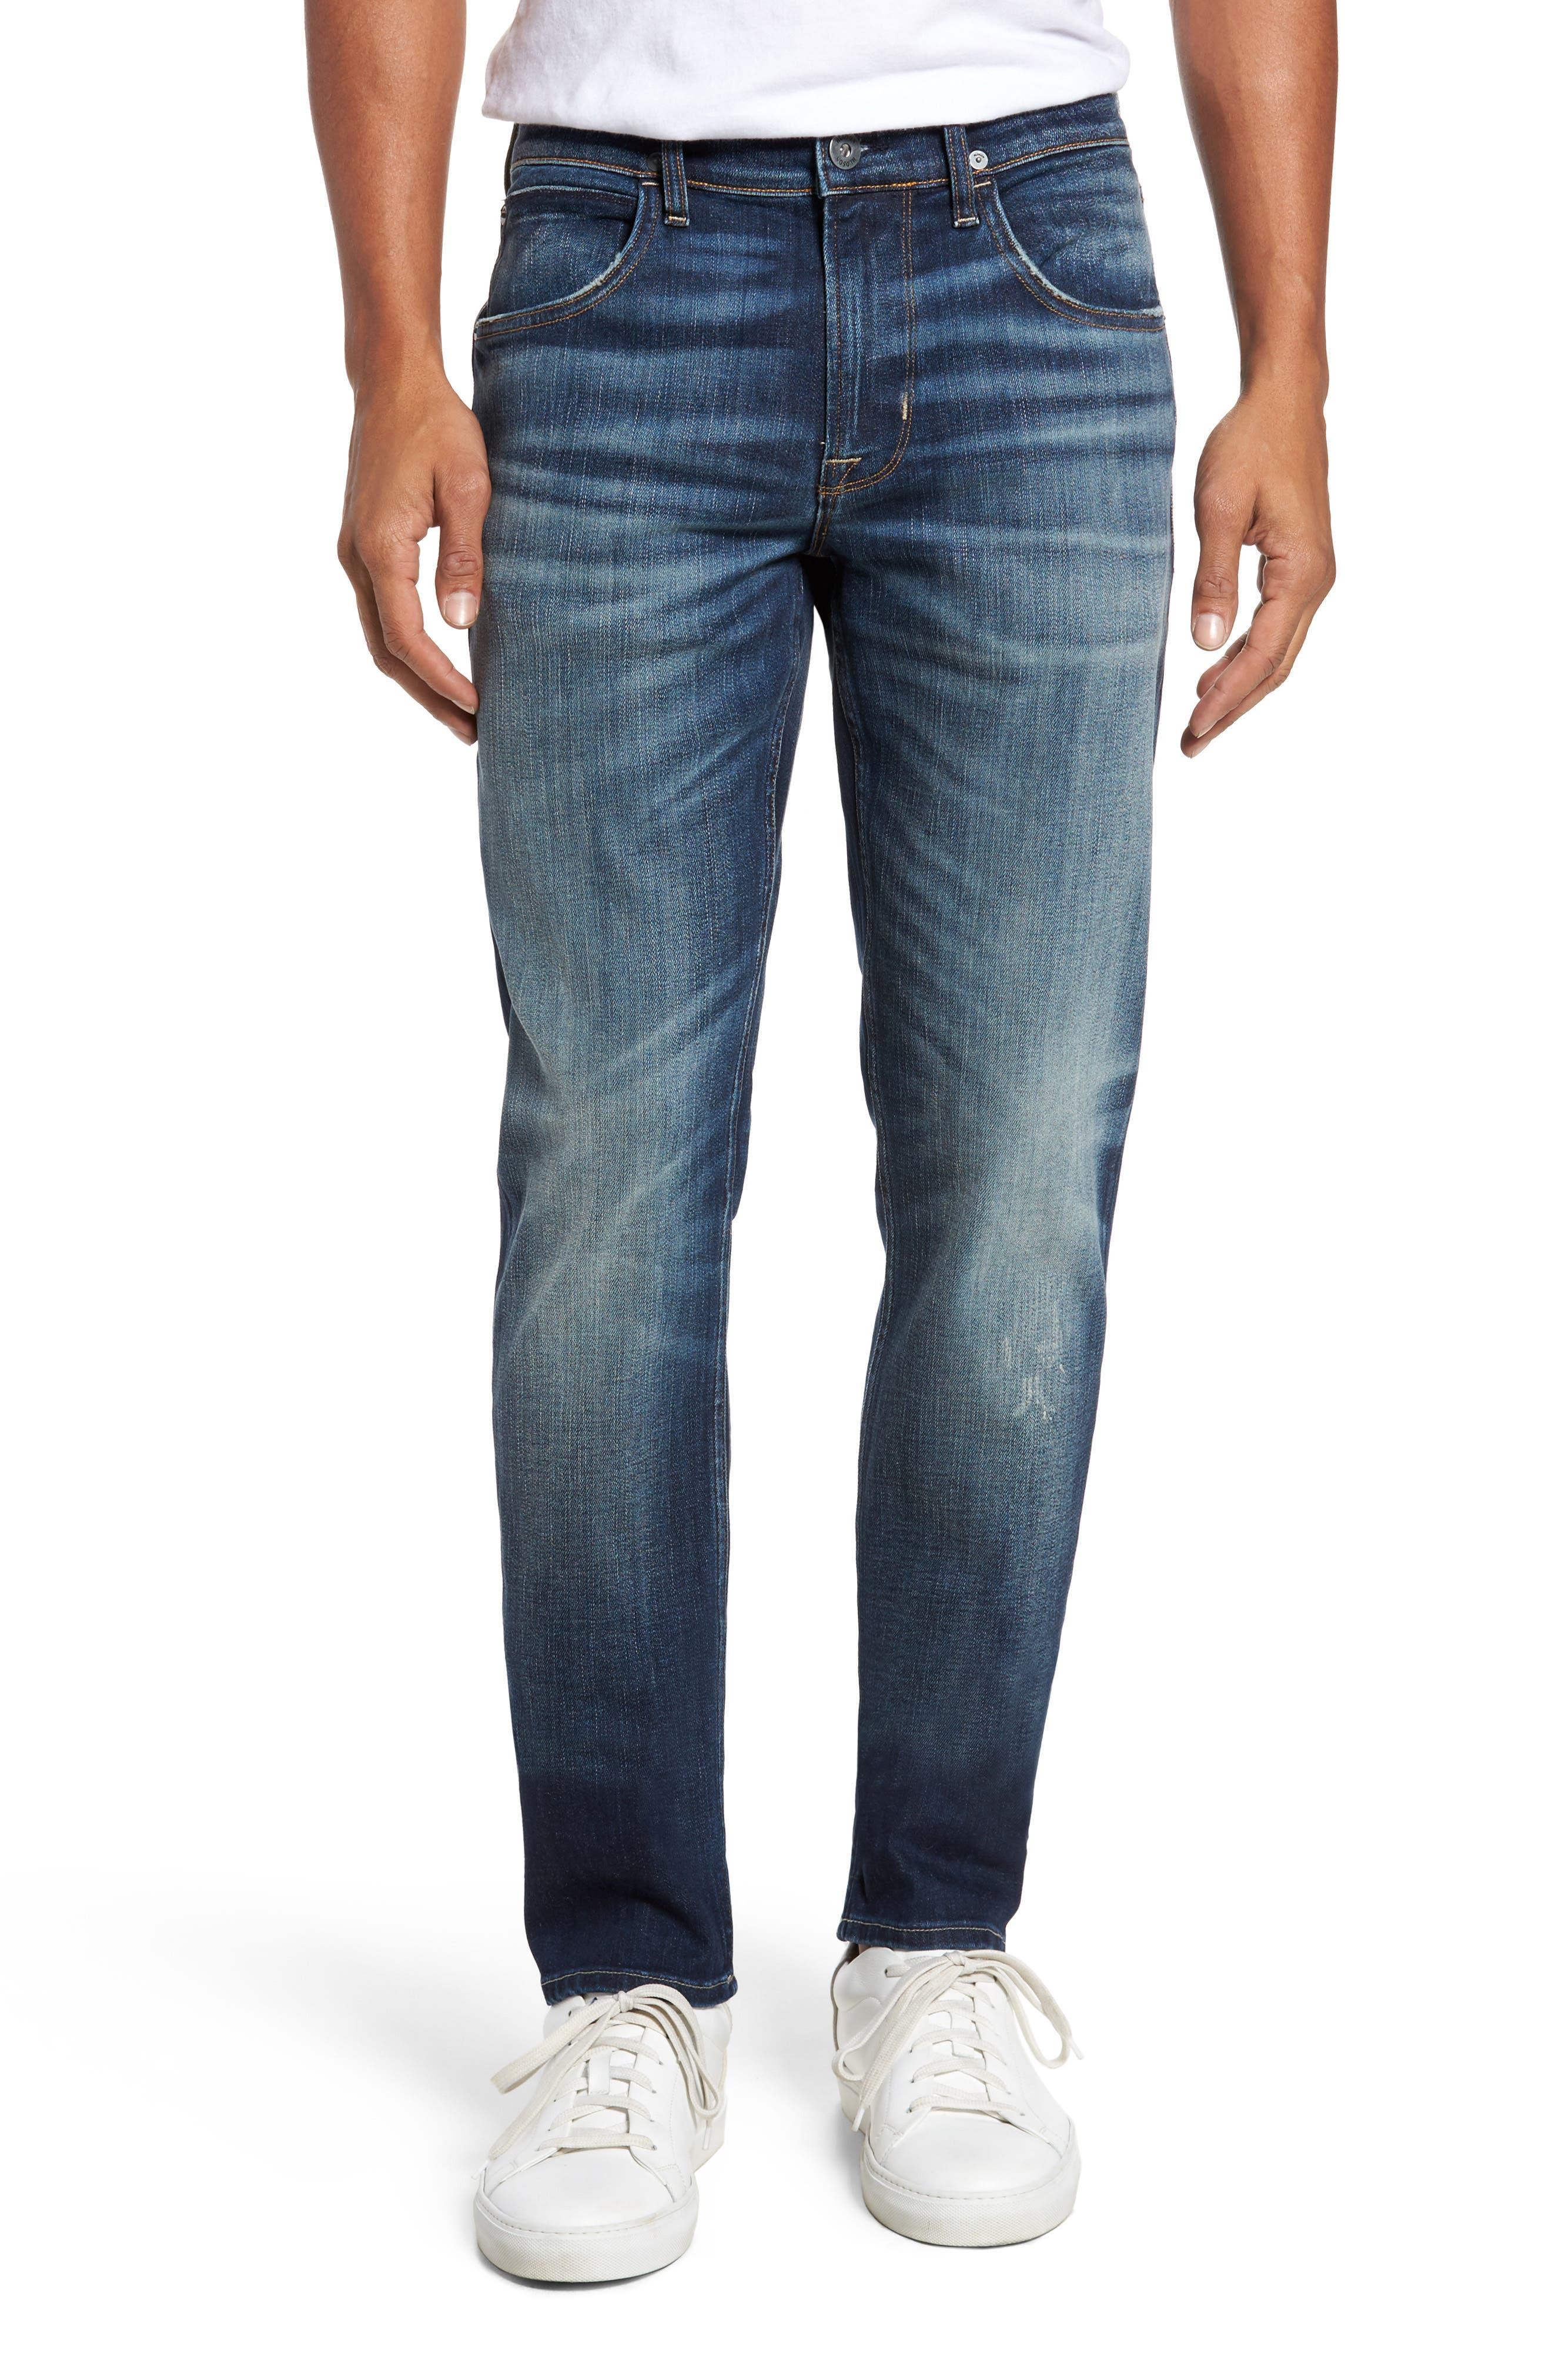 Main Image - Hudson Blake Slim Fit Jeans (Ban This)